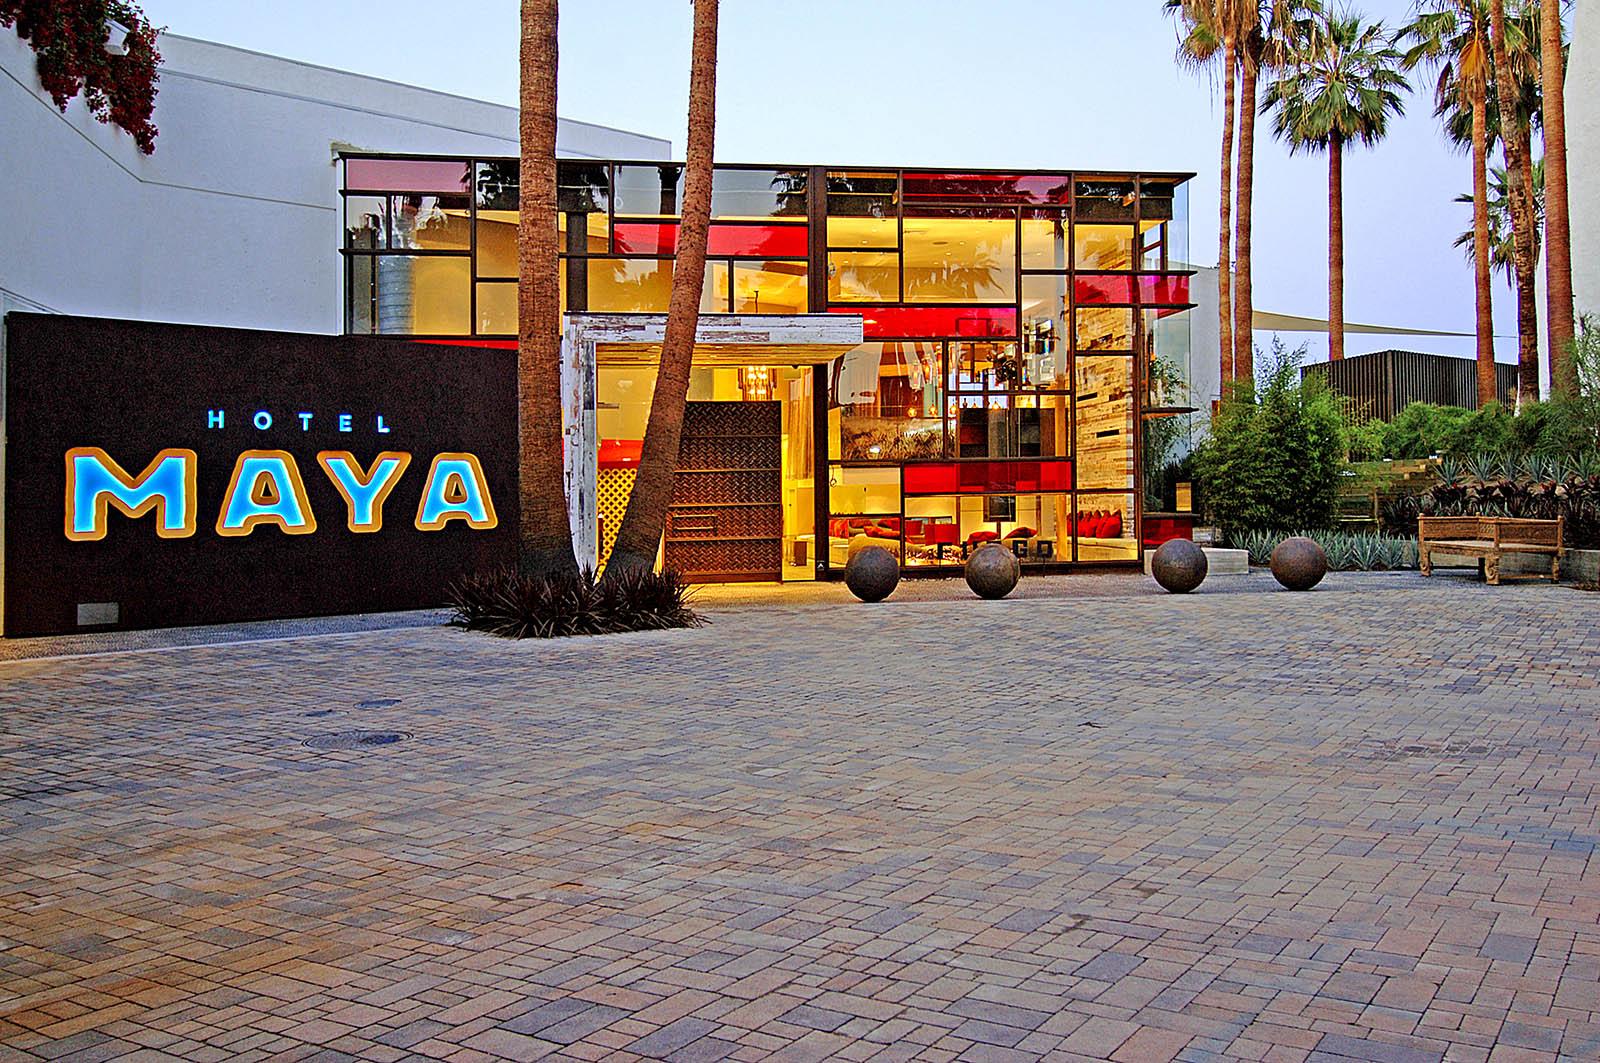 Hotel Maya Exterior.